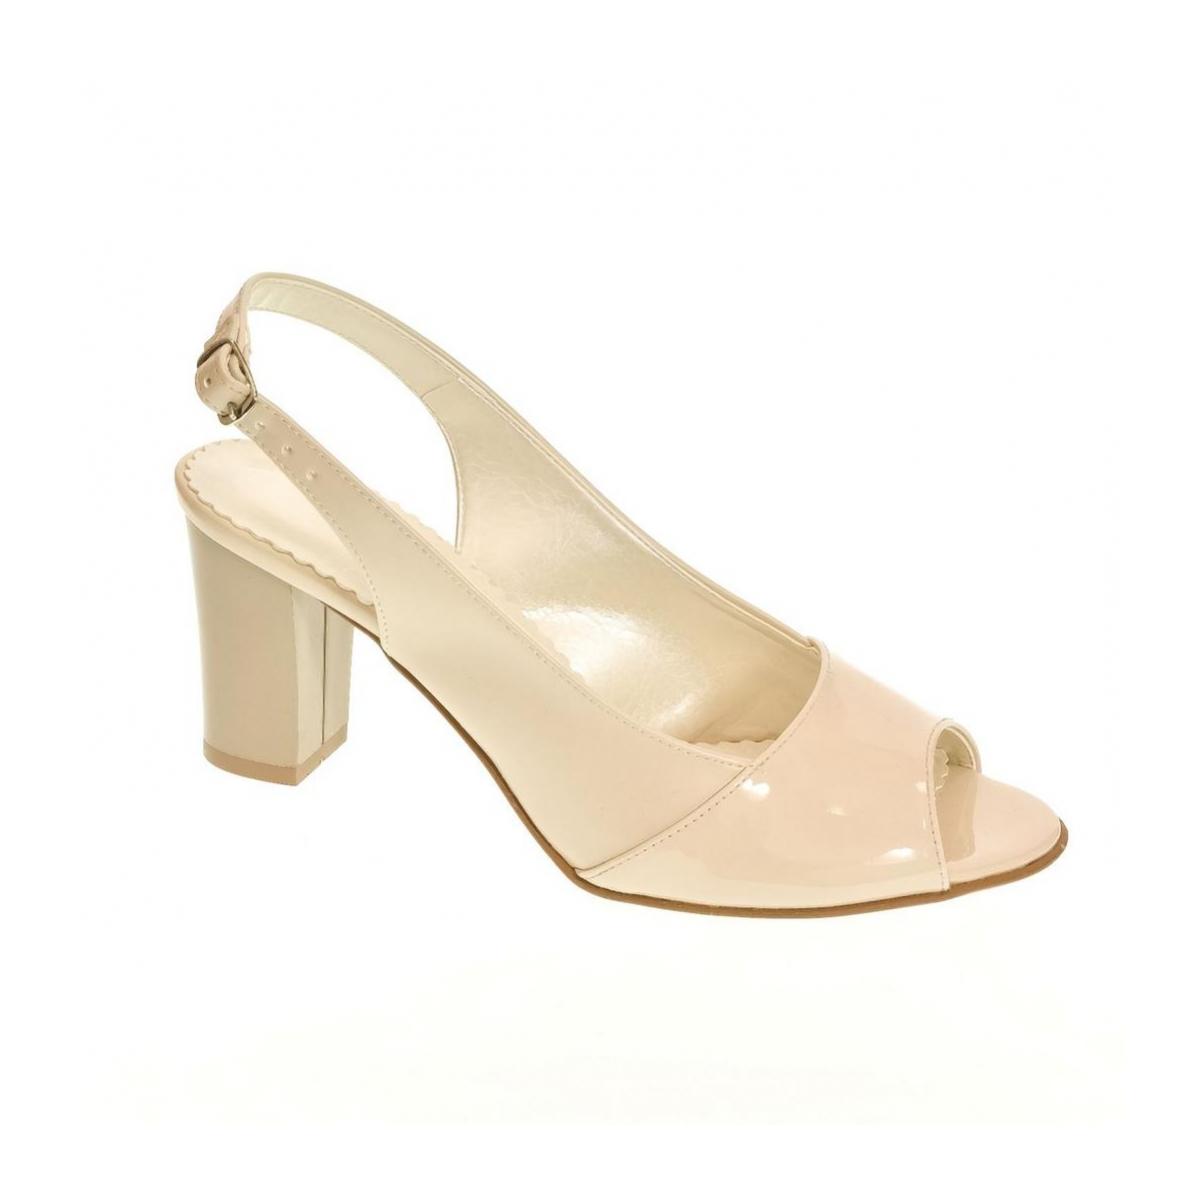 d7905e6d45ce Dámske bežové sandále SAINA - 4